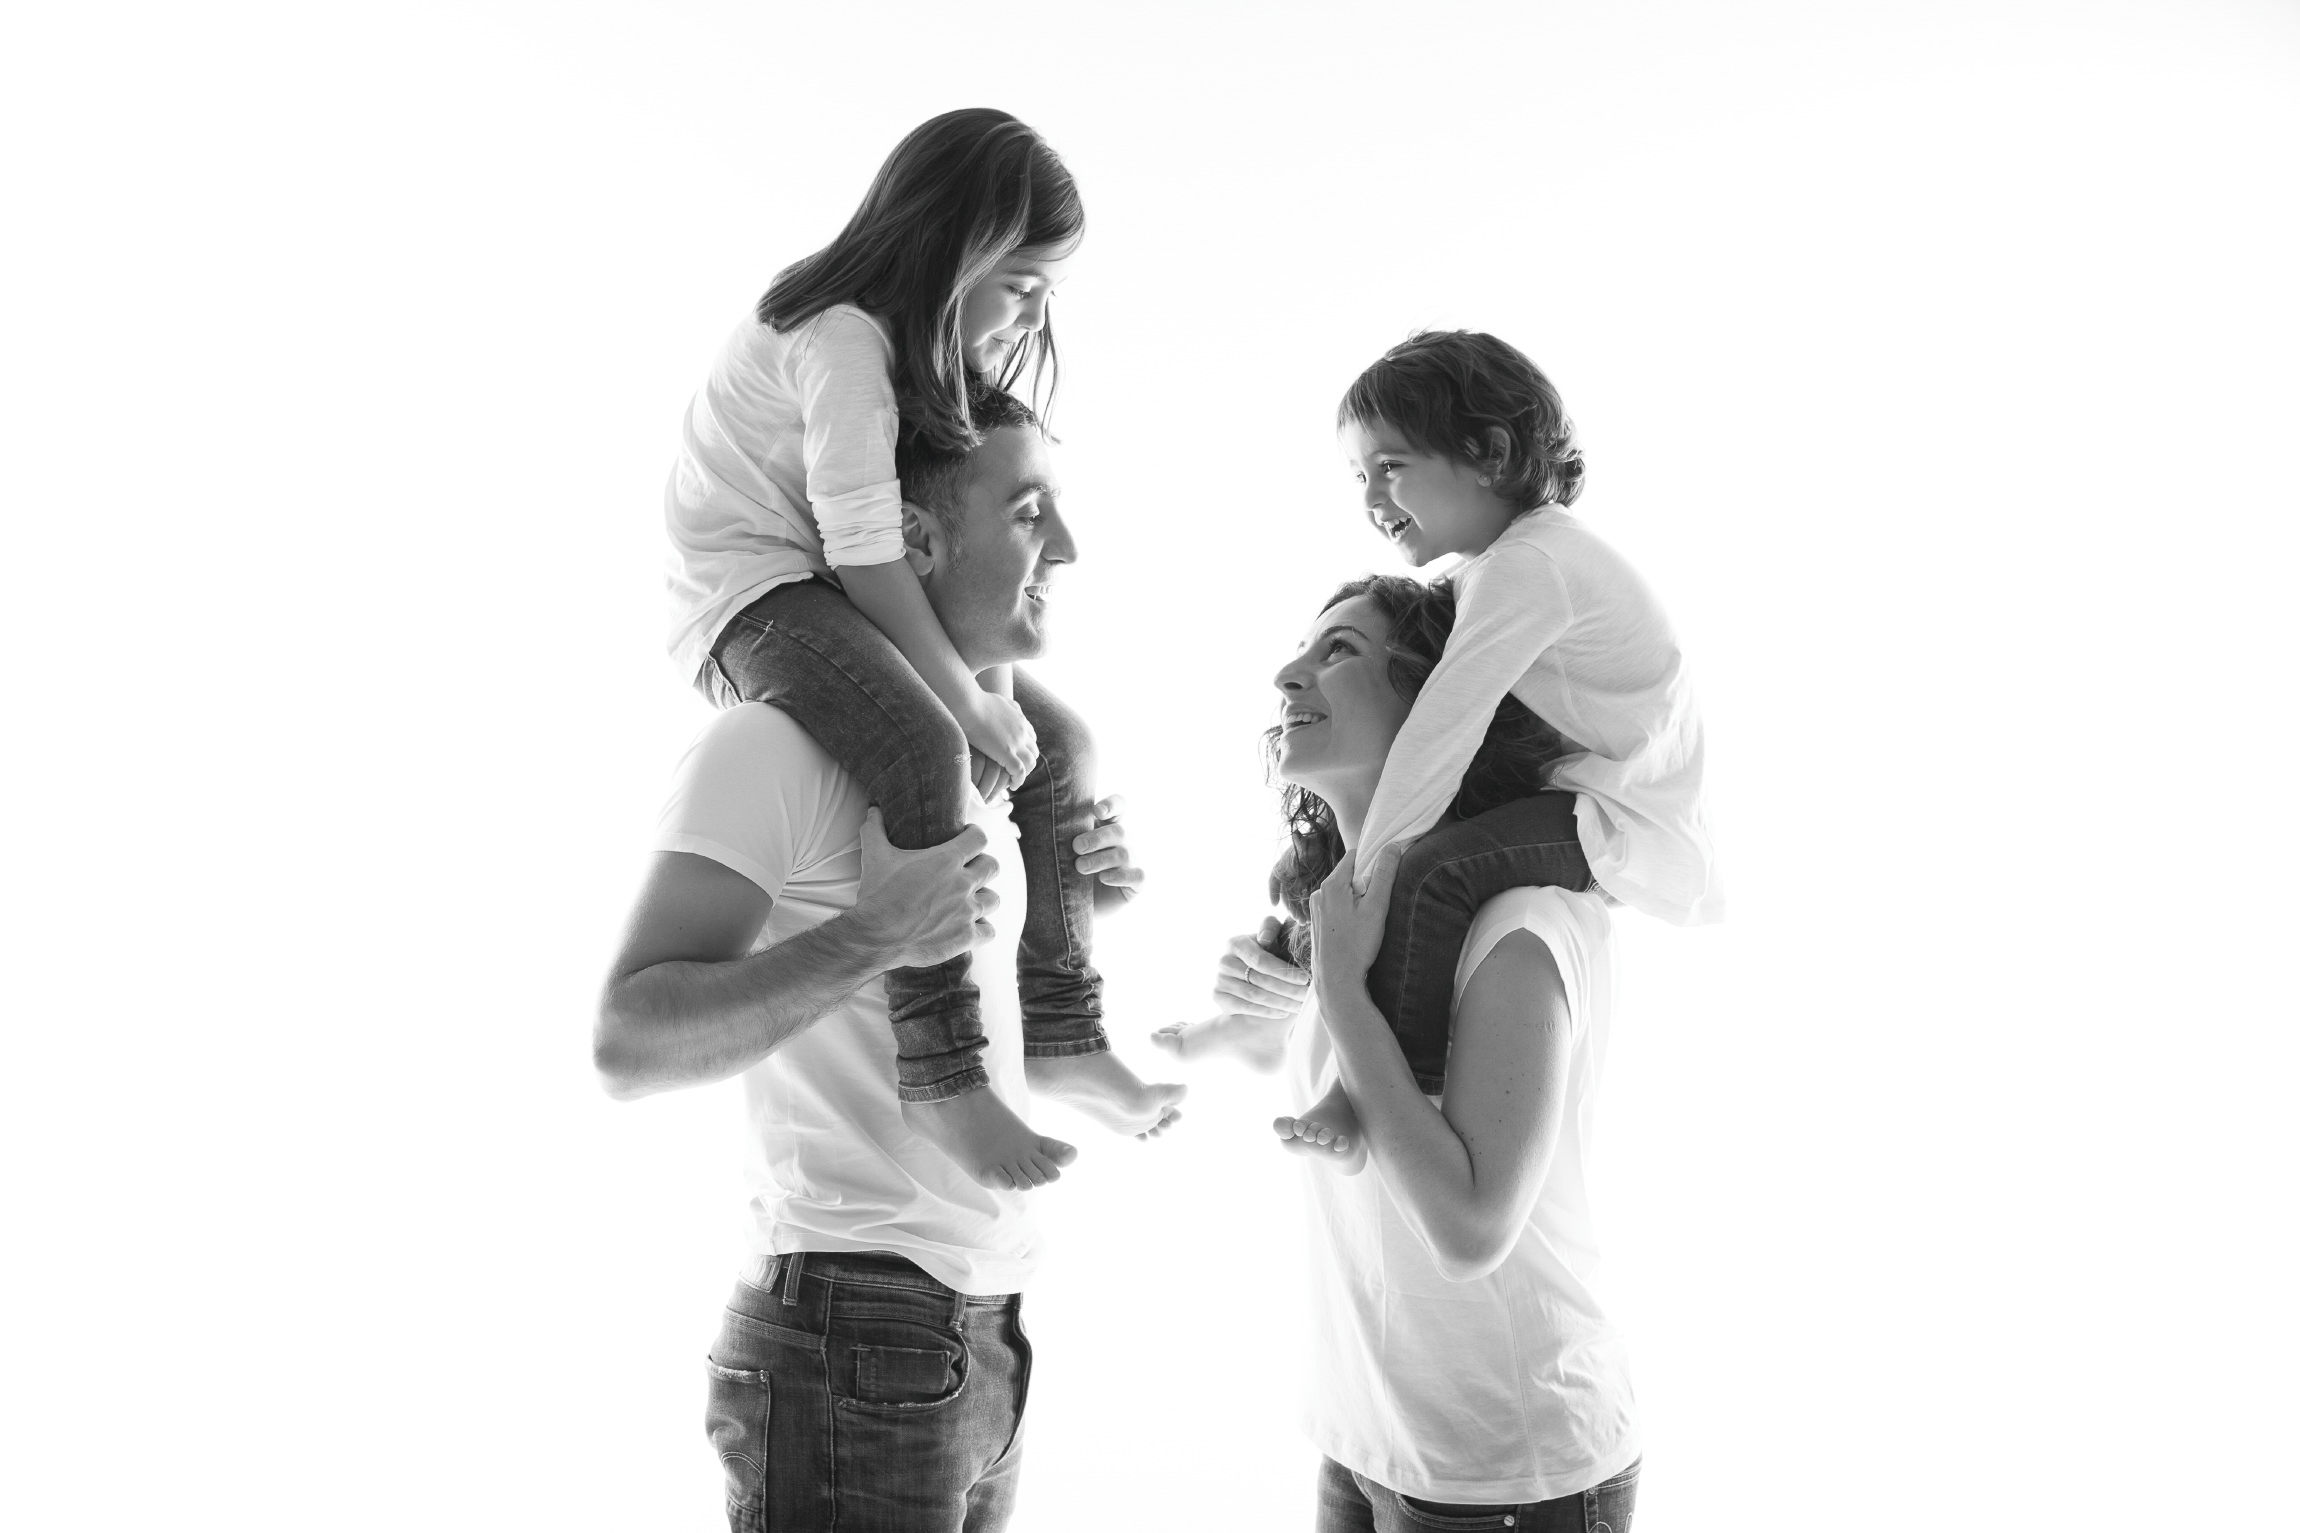 03-foto-familia-celine-pech-andorra100